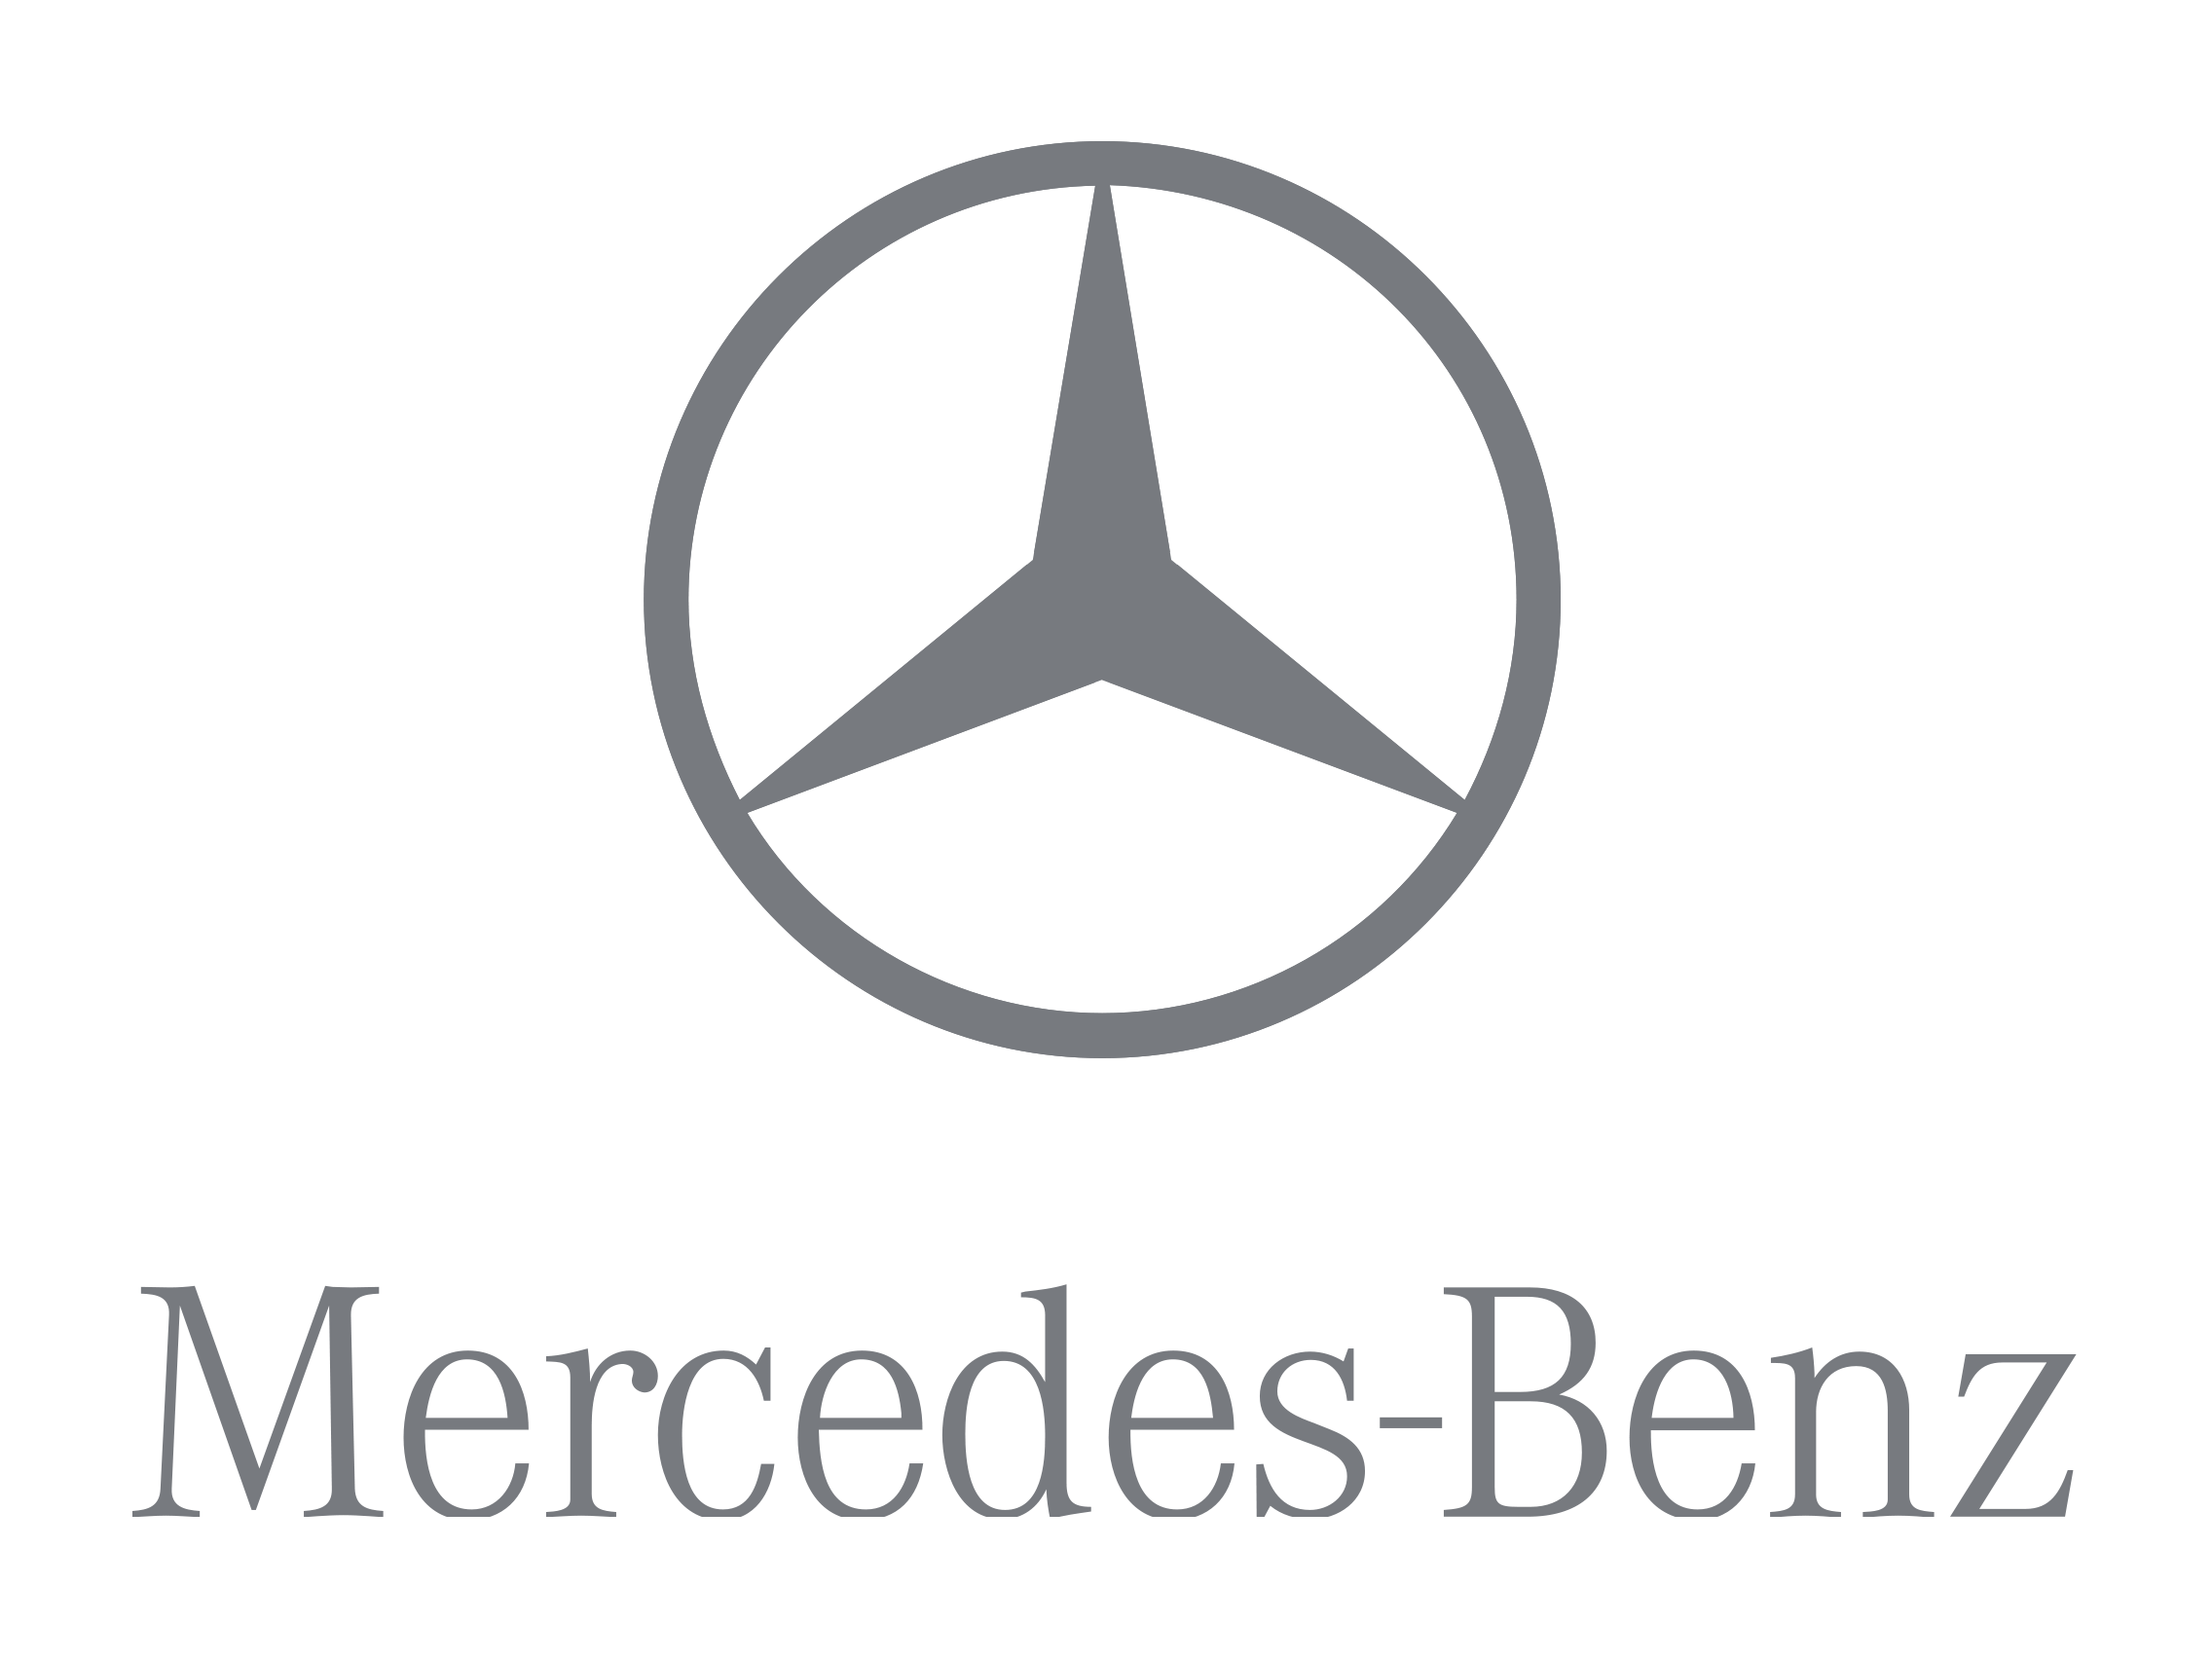 MORE. Array. Use Mercedes-Benz Logo PNG -MORE. Array. Use Mercedes-Benz Logo PNG Clipart ClipartLook.com -14